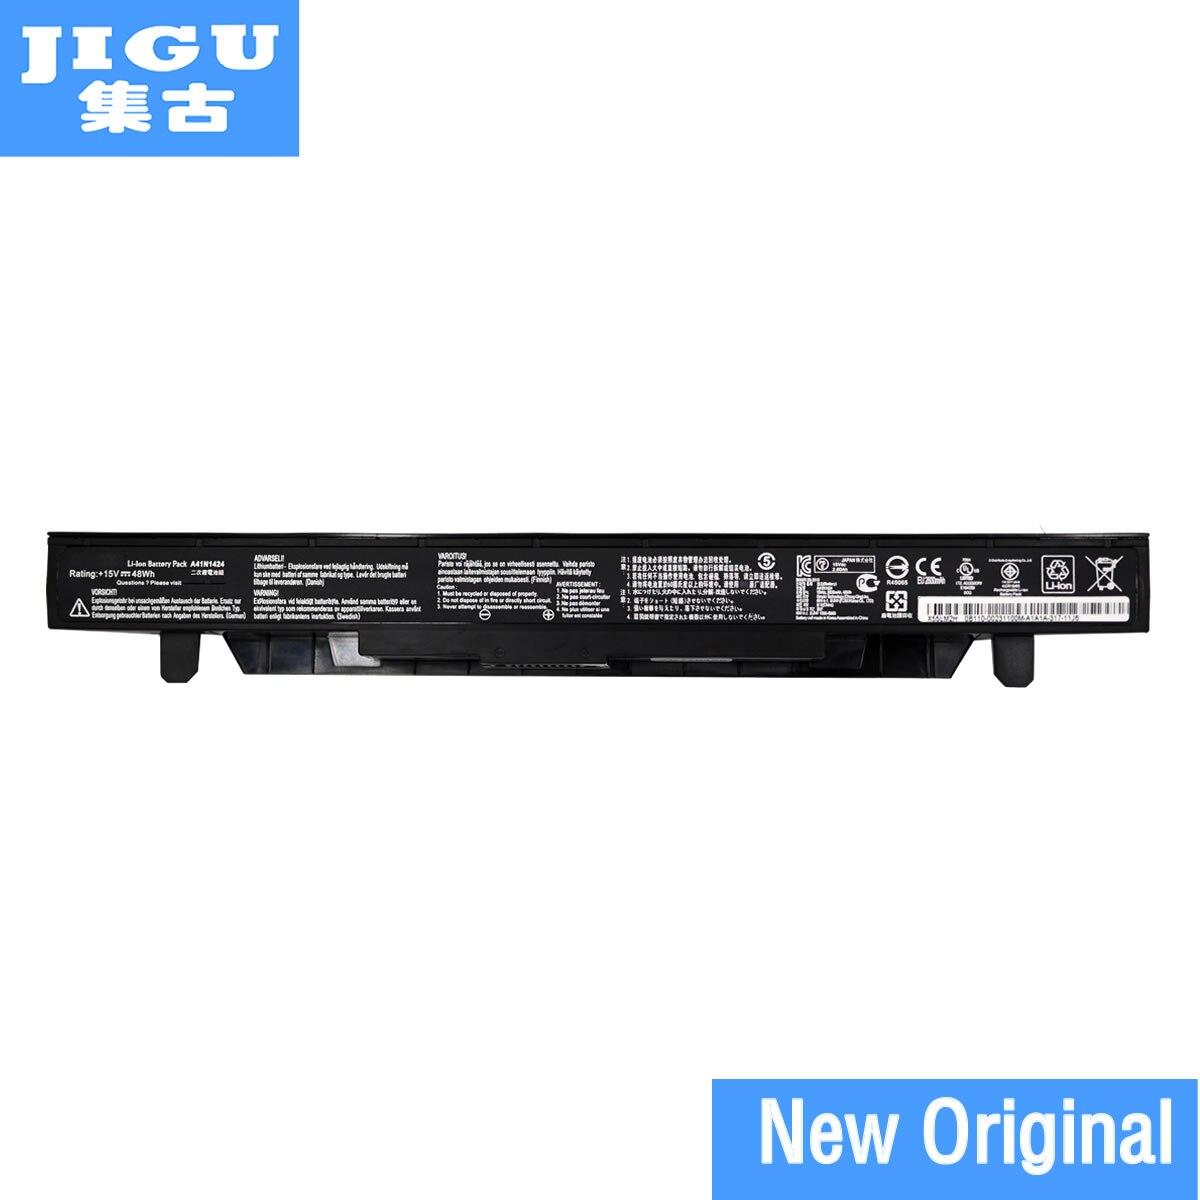 JIGU Laptop Battery For Asus G552VX GL552 GL552J GL552JX GL552V GL552VW ROG FX PLUS GL552 GL552J